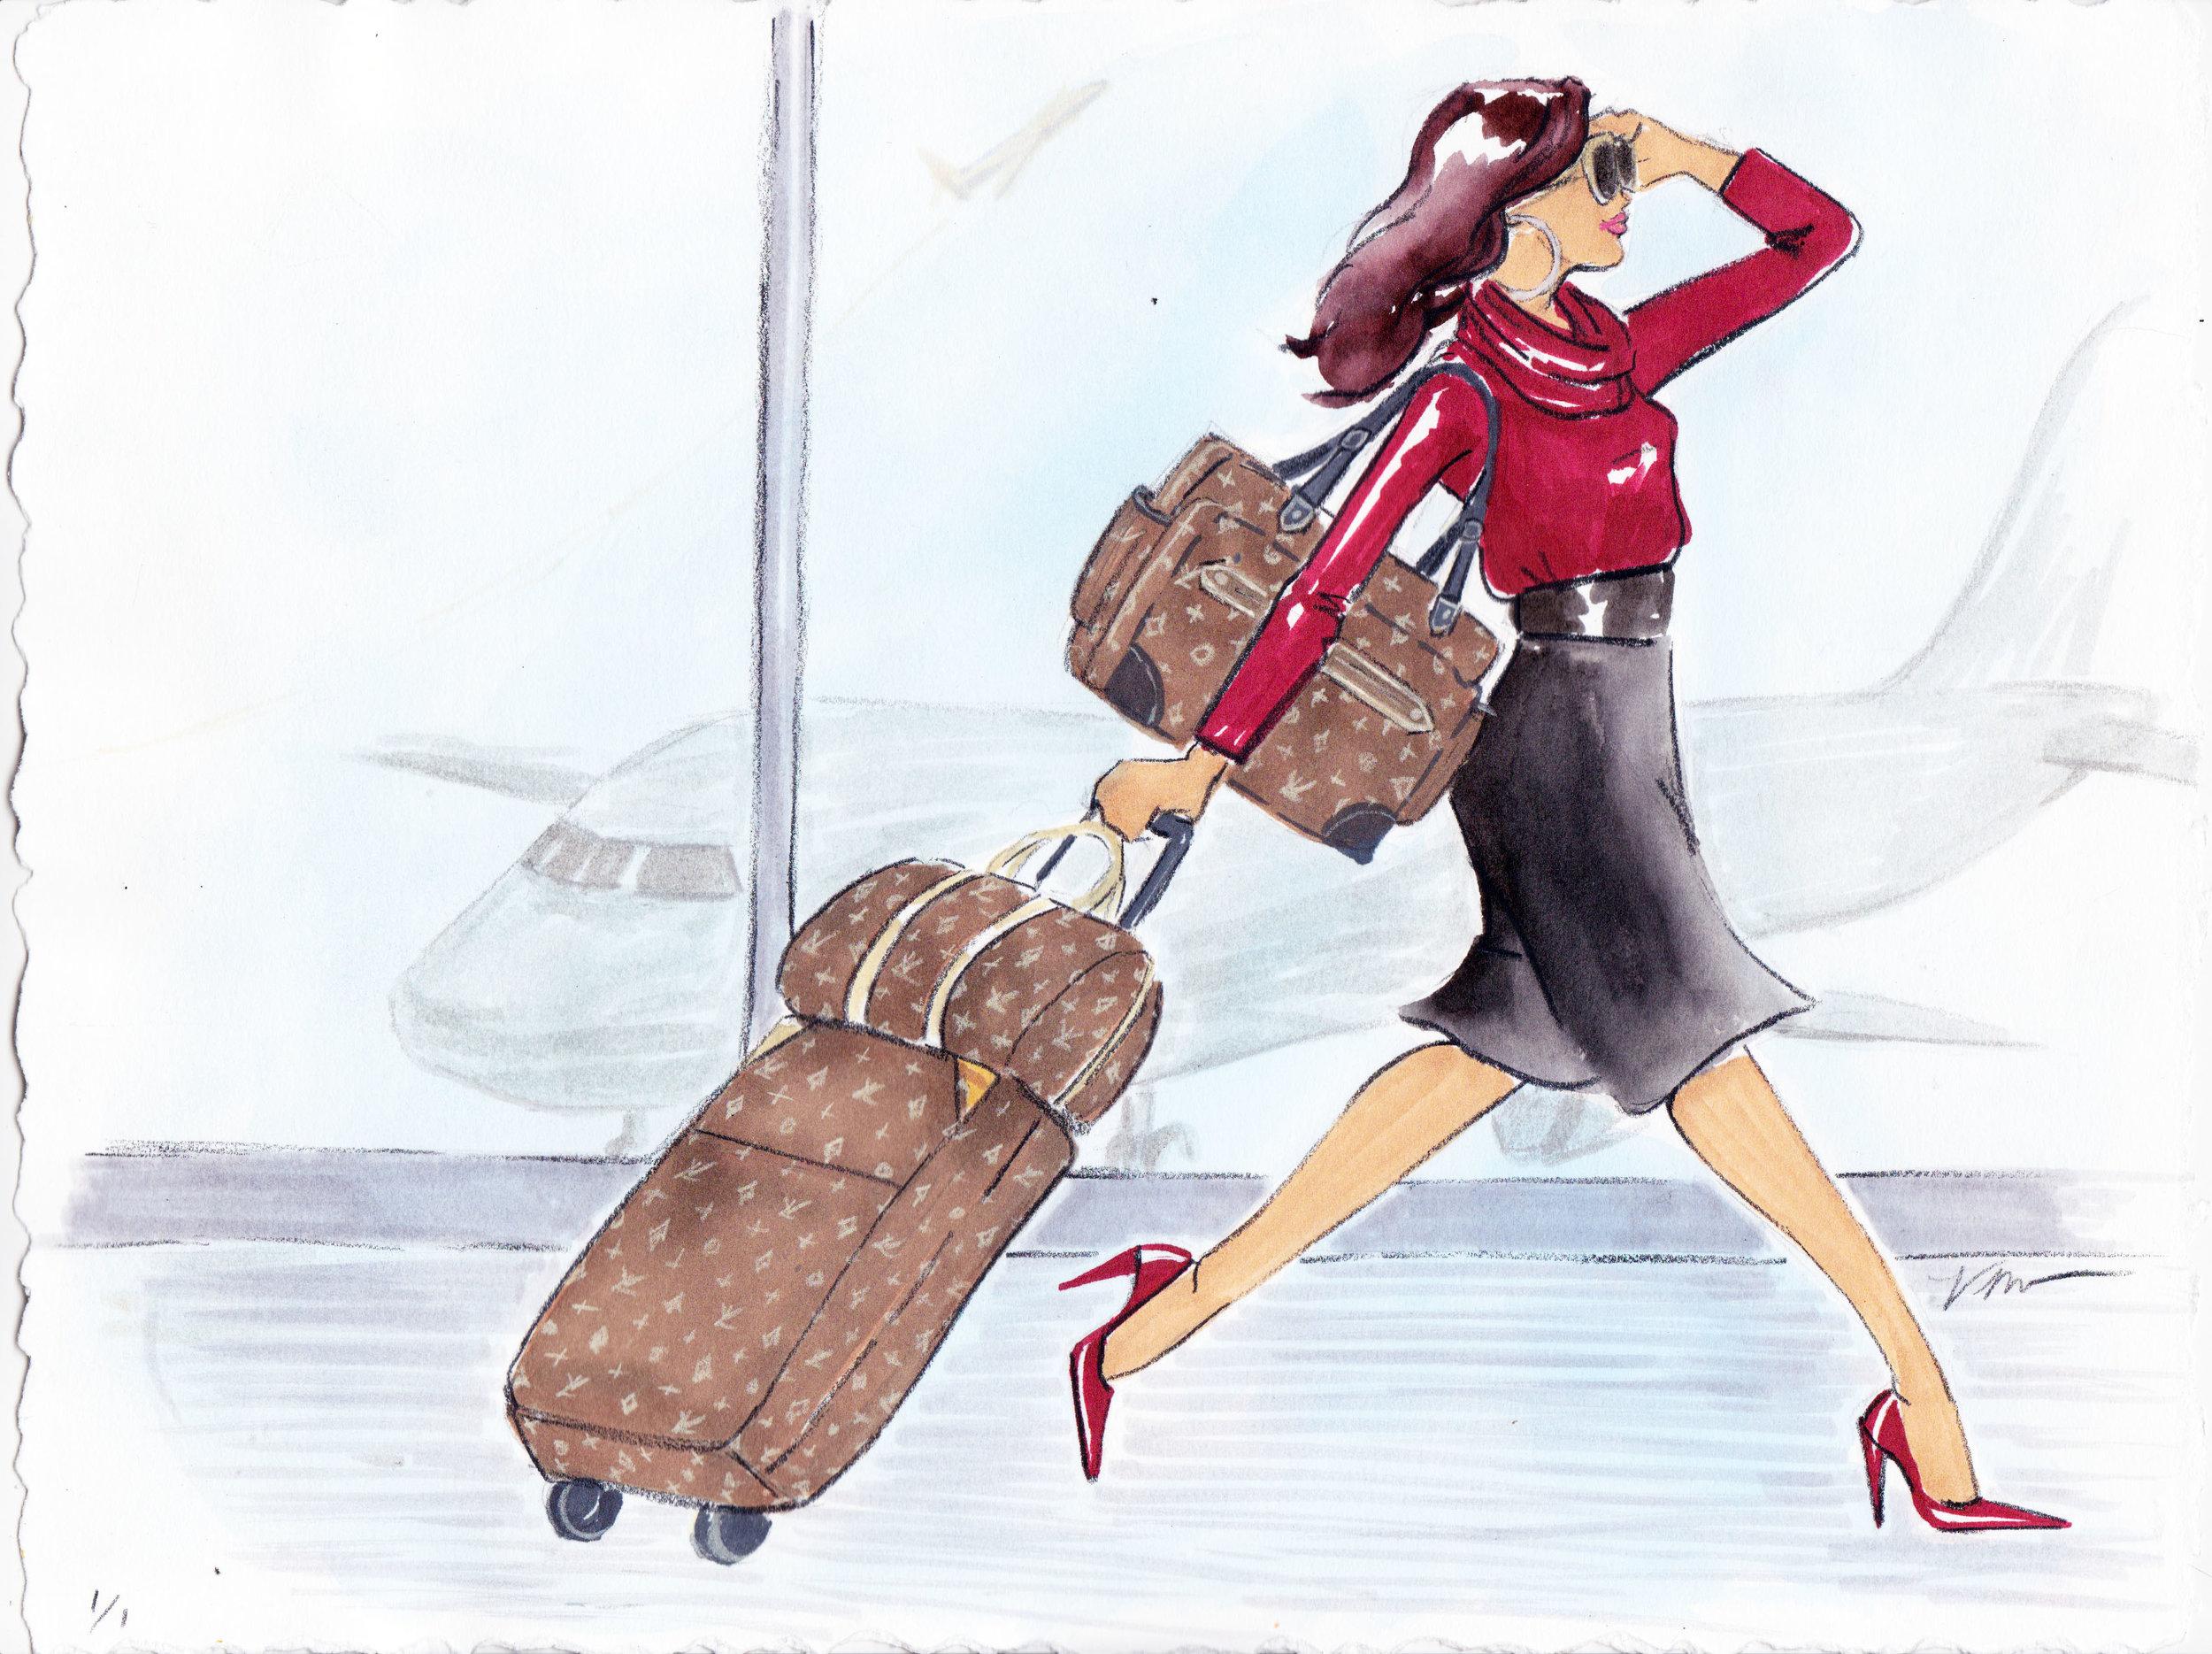 Travel Illustration by Veronica Miller Jamison, Veronica Jamison Art